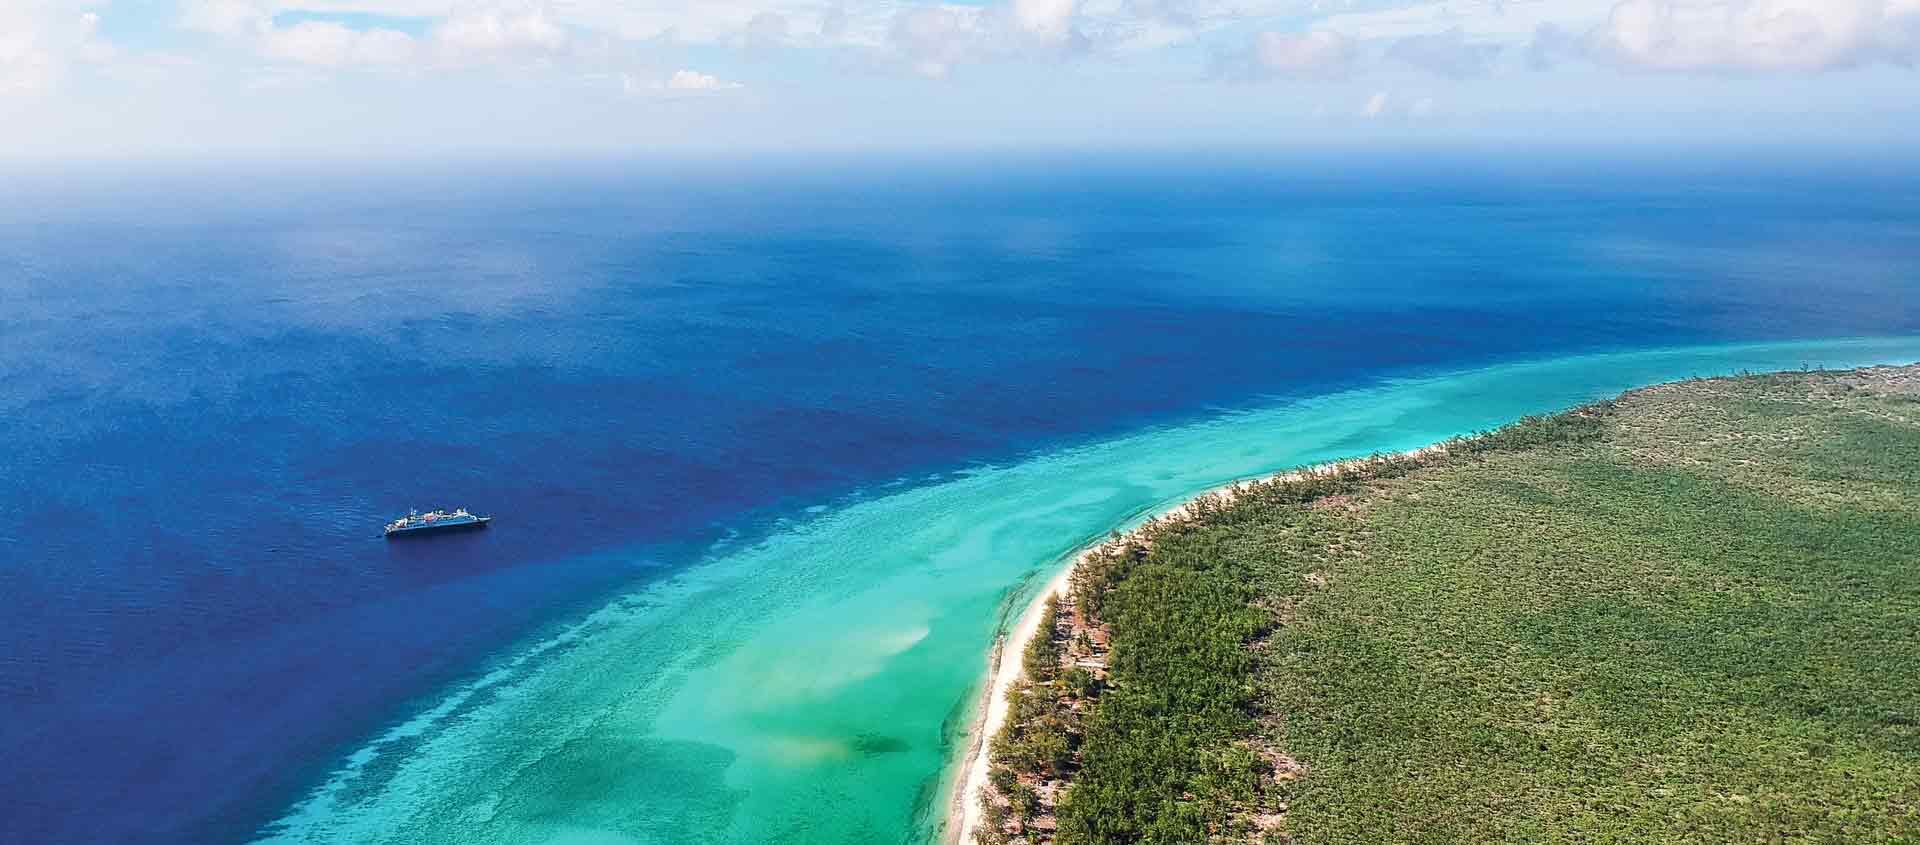 Seychelles Islands cruise aerial photo of Aldabra Atoll